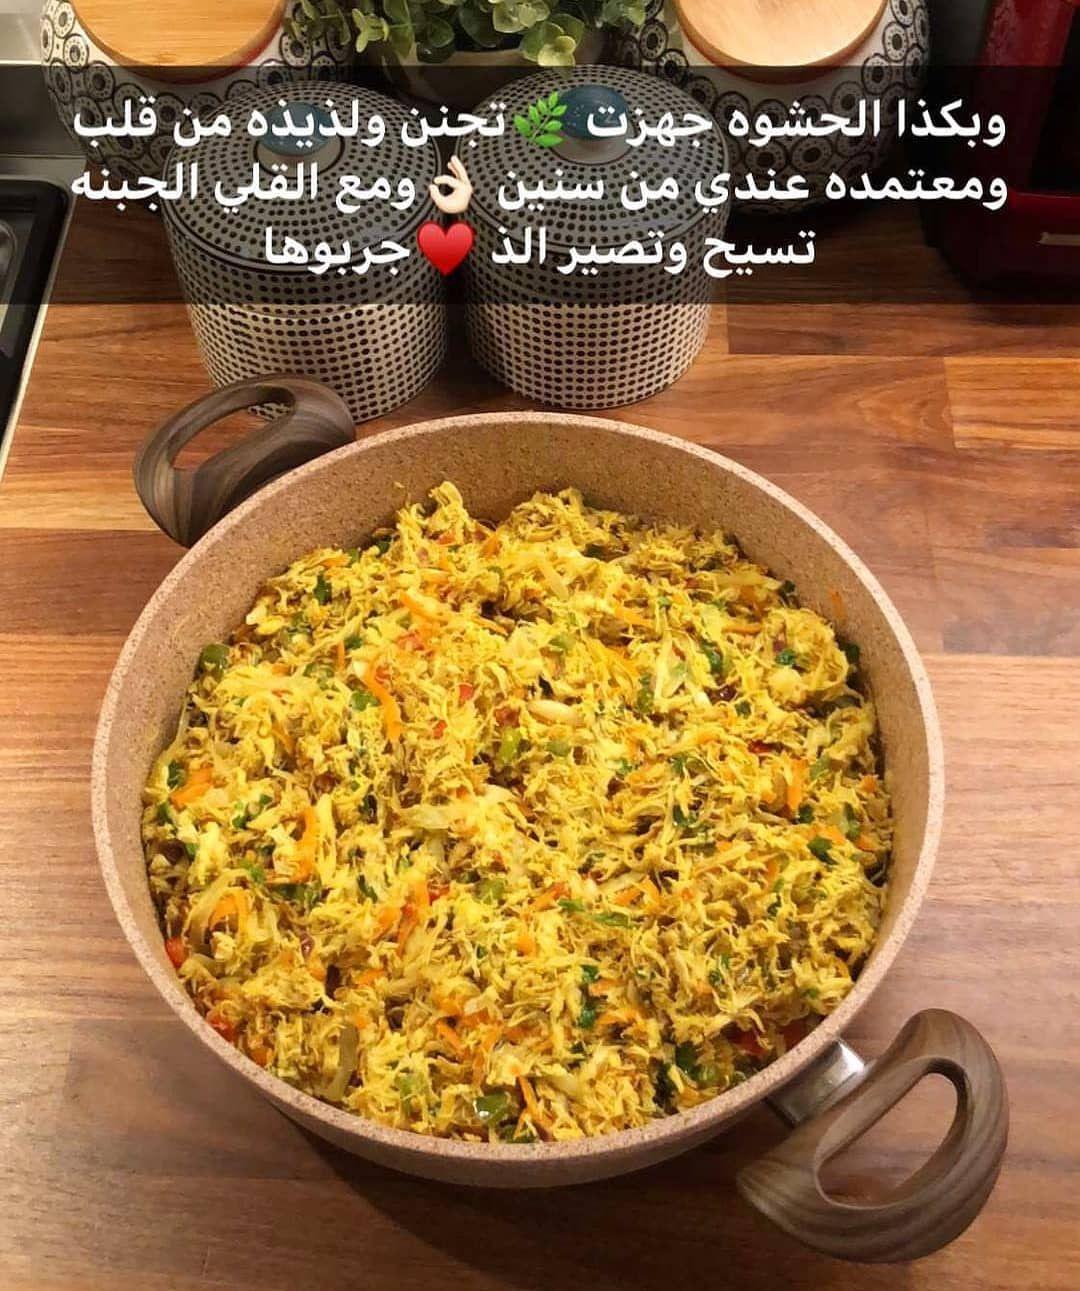 سبرنق رول بحشوة الاجبان والنعناع Arabic Food Food Receipes Baby Food Recipes